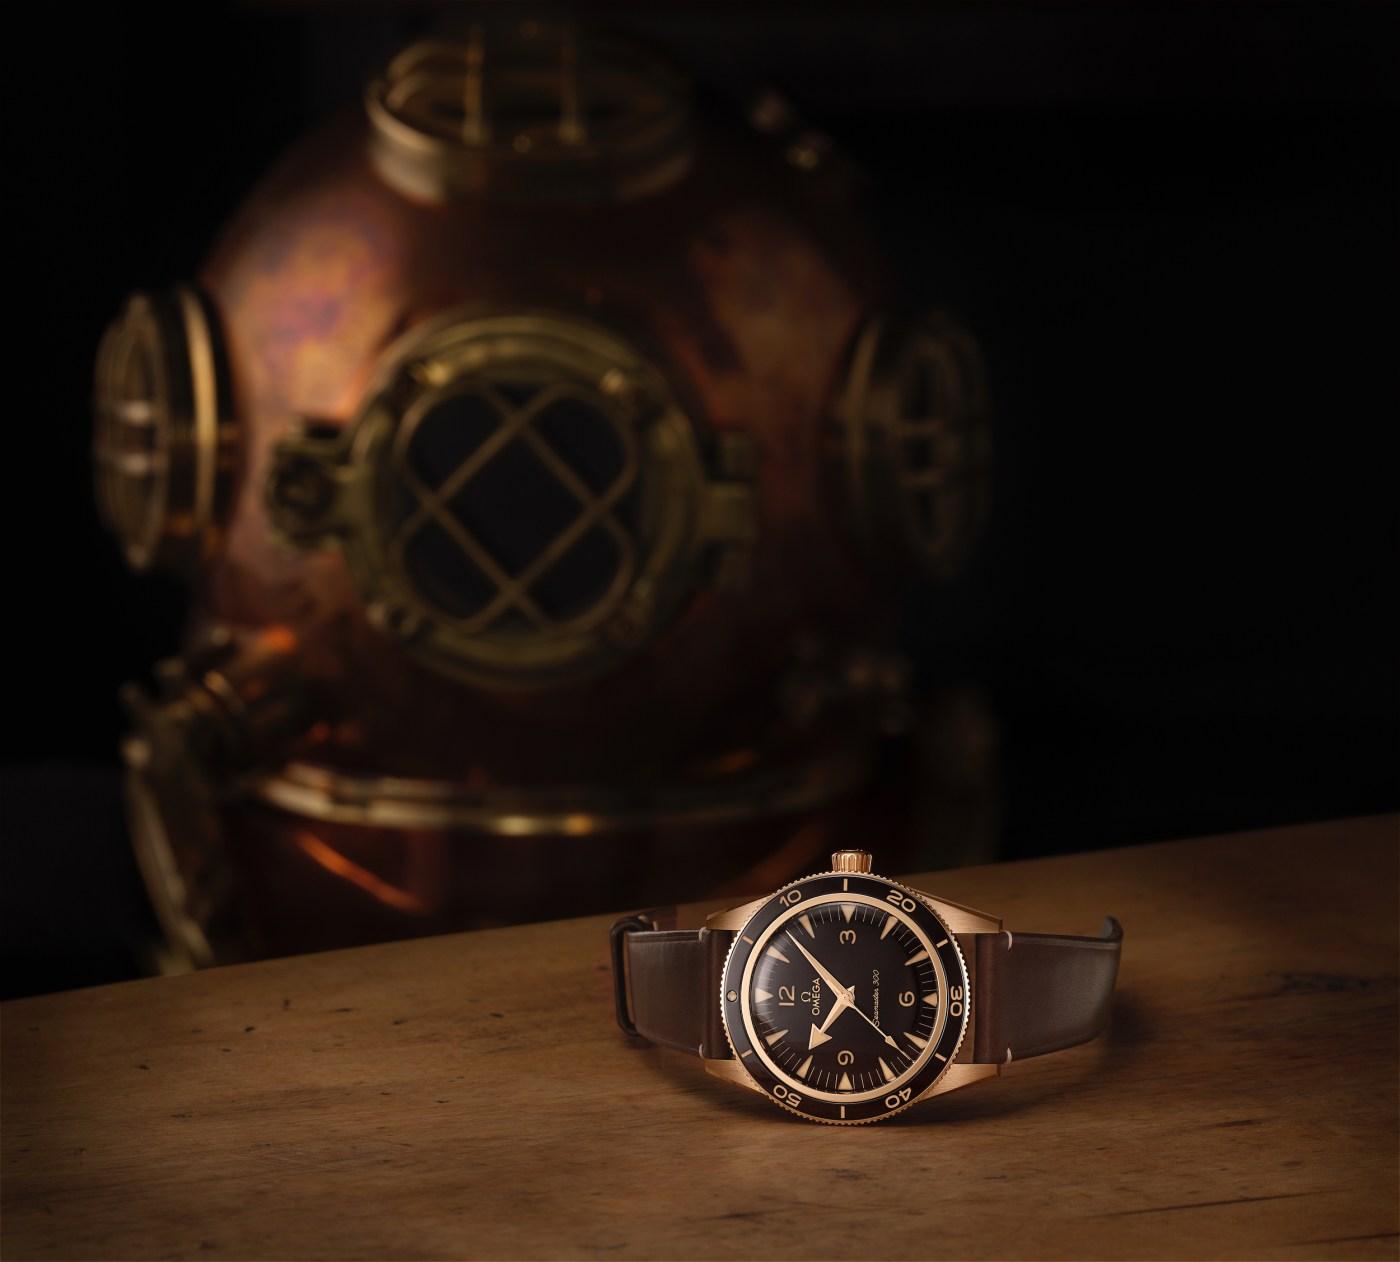 2021 Omega Seamaster 300 bronze gold 234.92.41.21.10.001